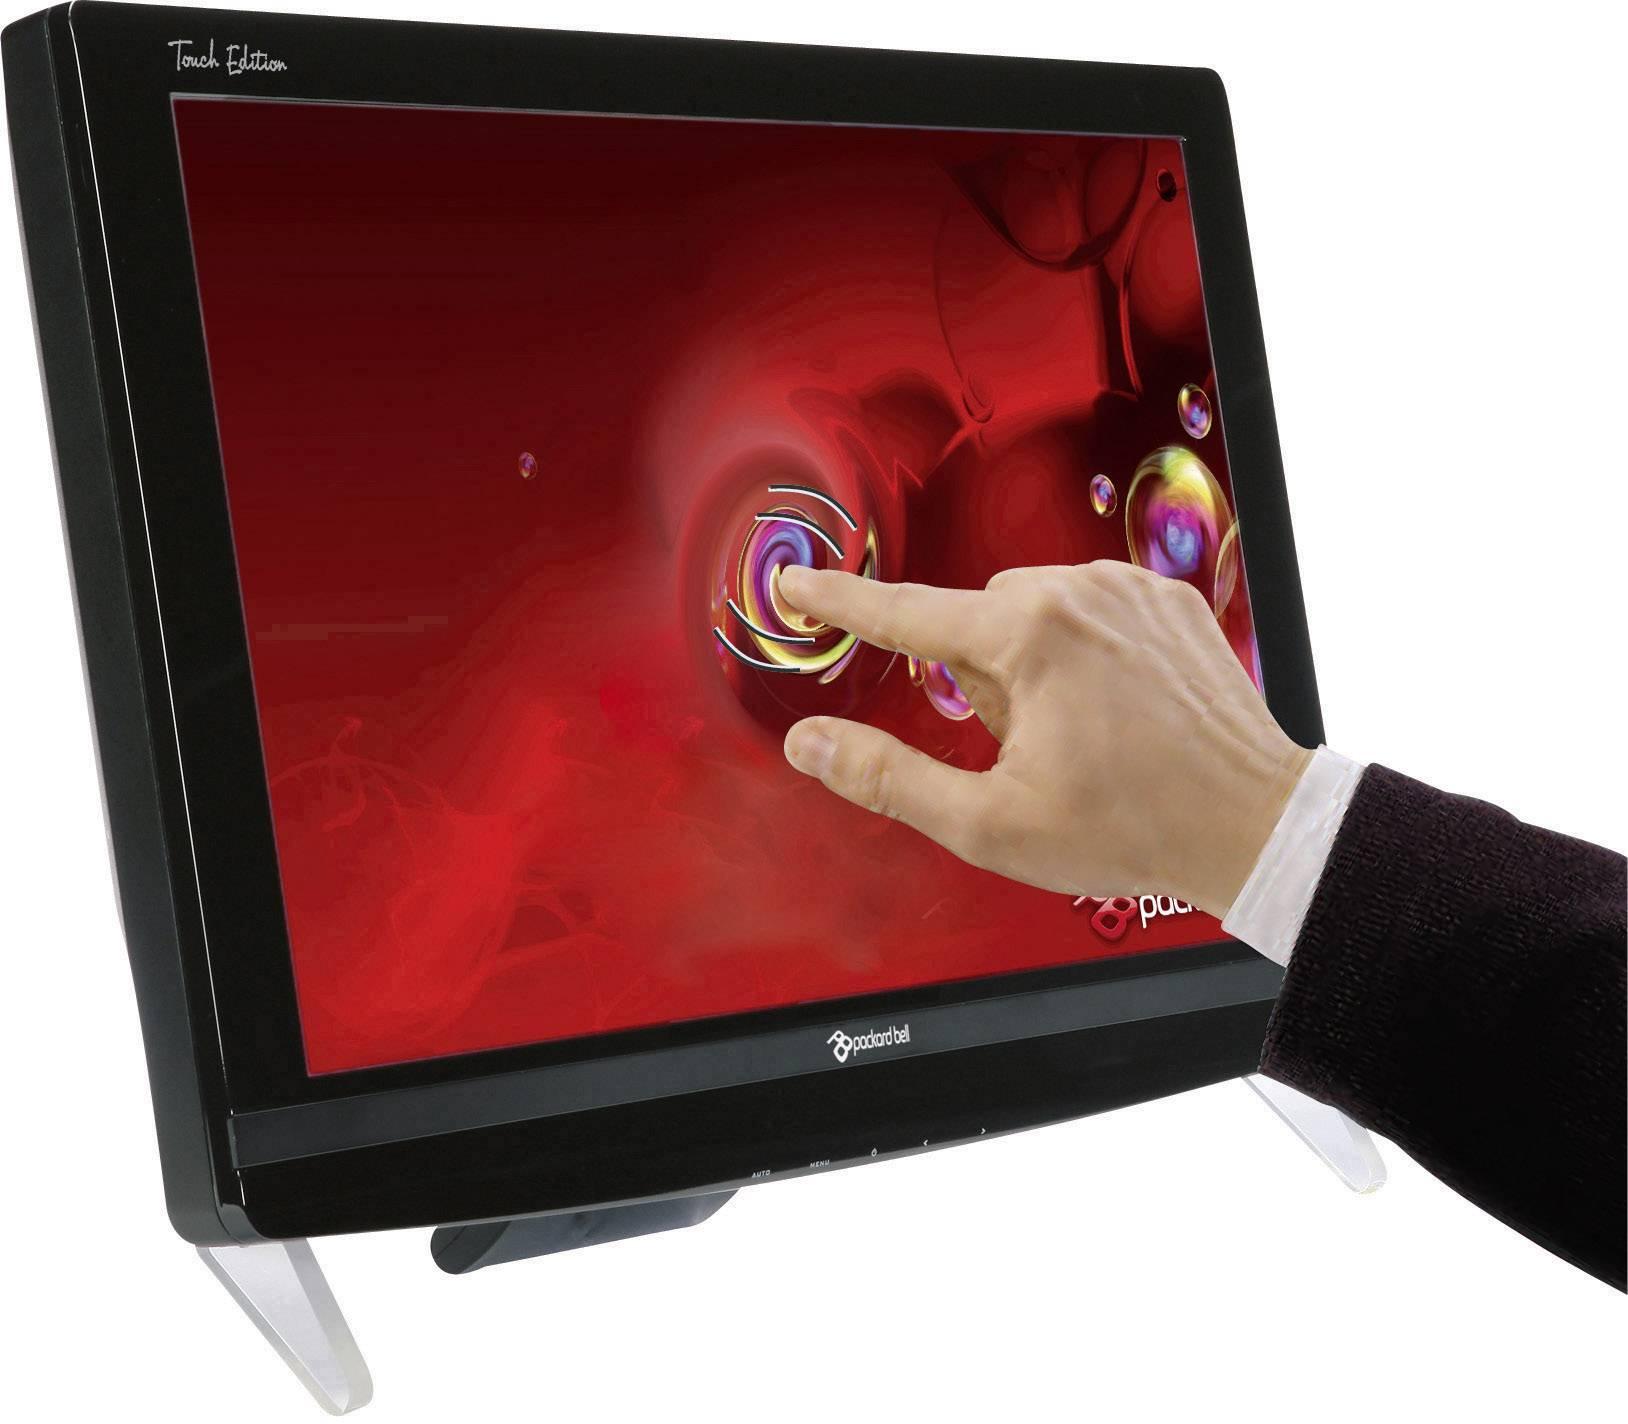 "Packard Bell 20"" TFT Monitor"